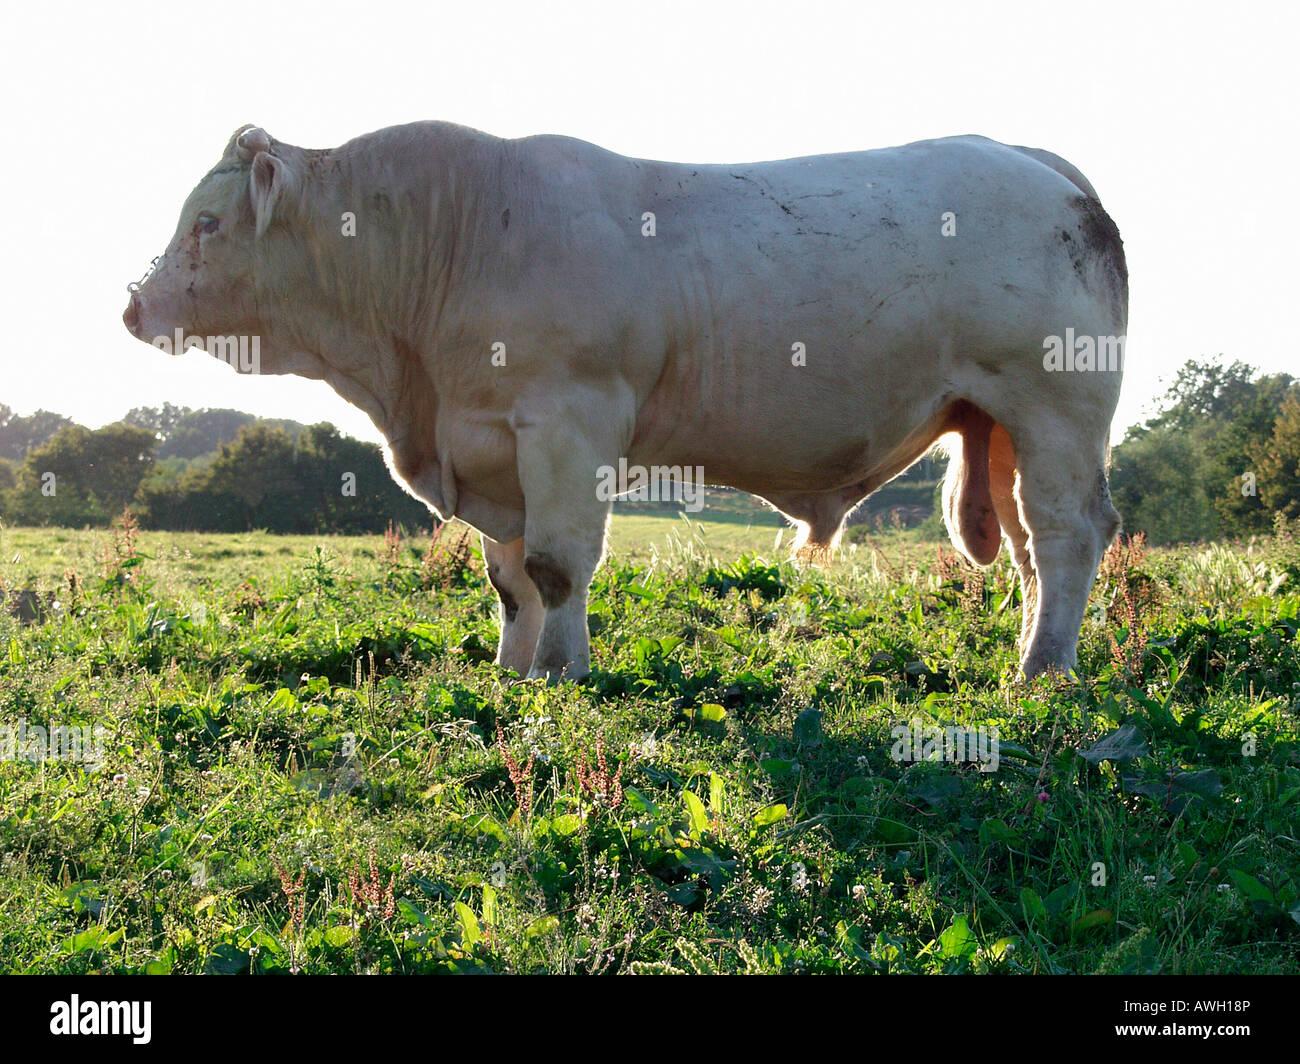 taureau Charolais au pré Bos taurus domesticus Aestival seasons Agriculture Agricultures Alone Animal breeding - Stock Image